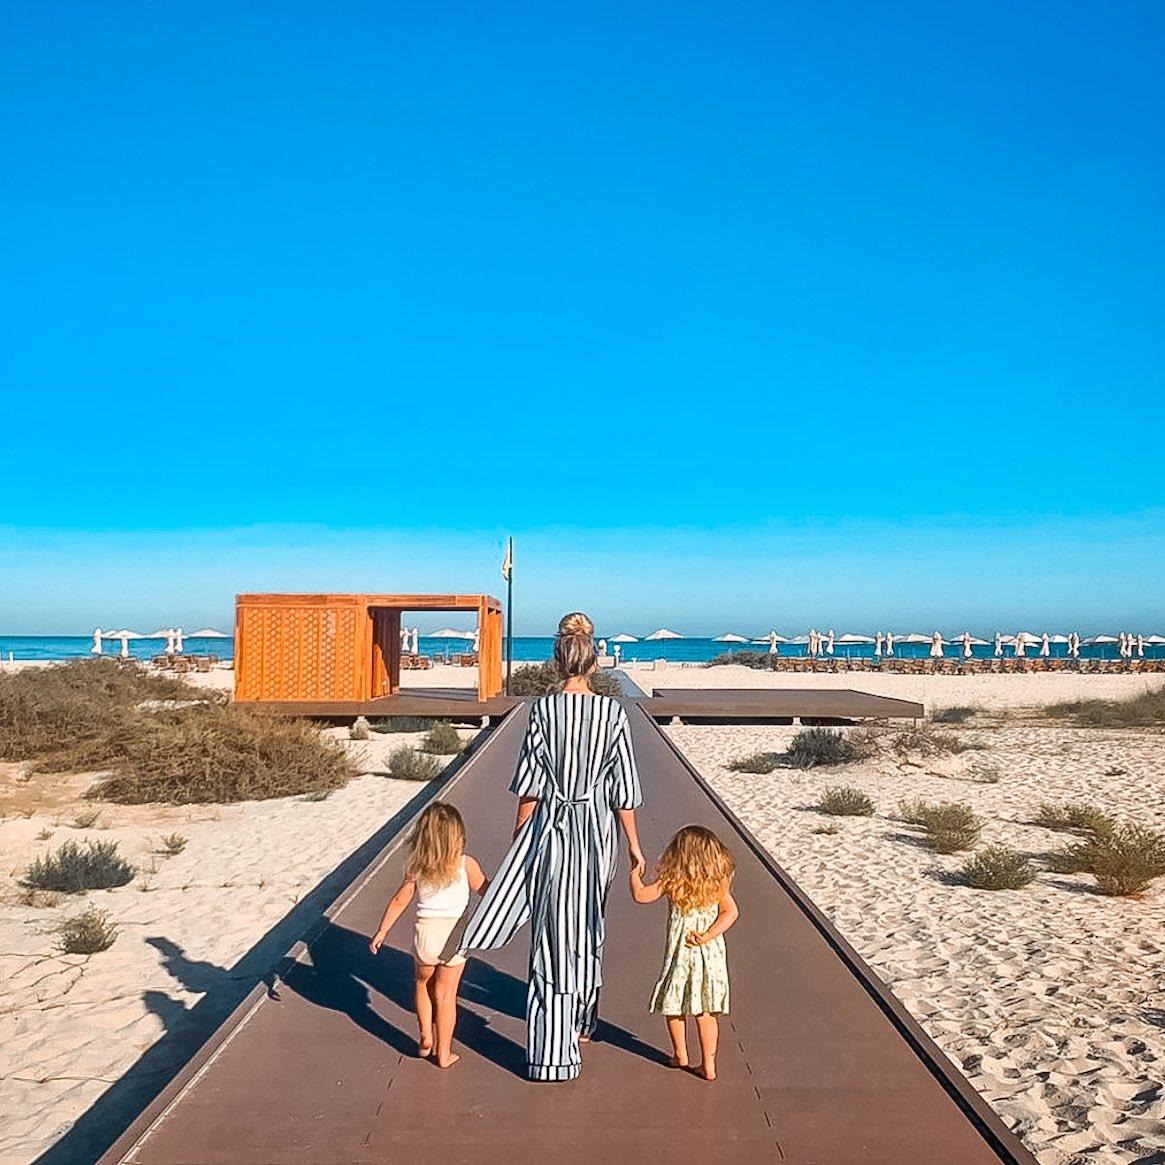 Sea, sun, family and happy memories. That's all what we need!   📷: @thelittlebrownblog   #SaadiyatRotana #FamilyBeachDay #SaadiyatIsland #inAbuDhabi https://t.co/P0kUMXeOf3